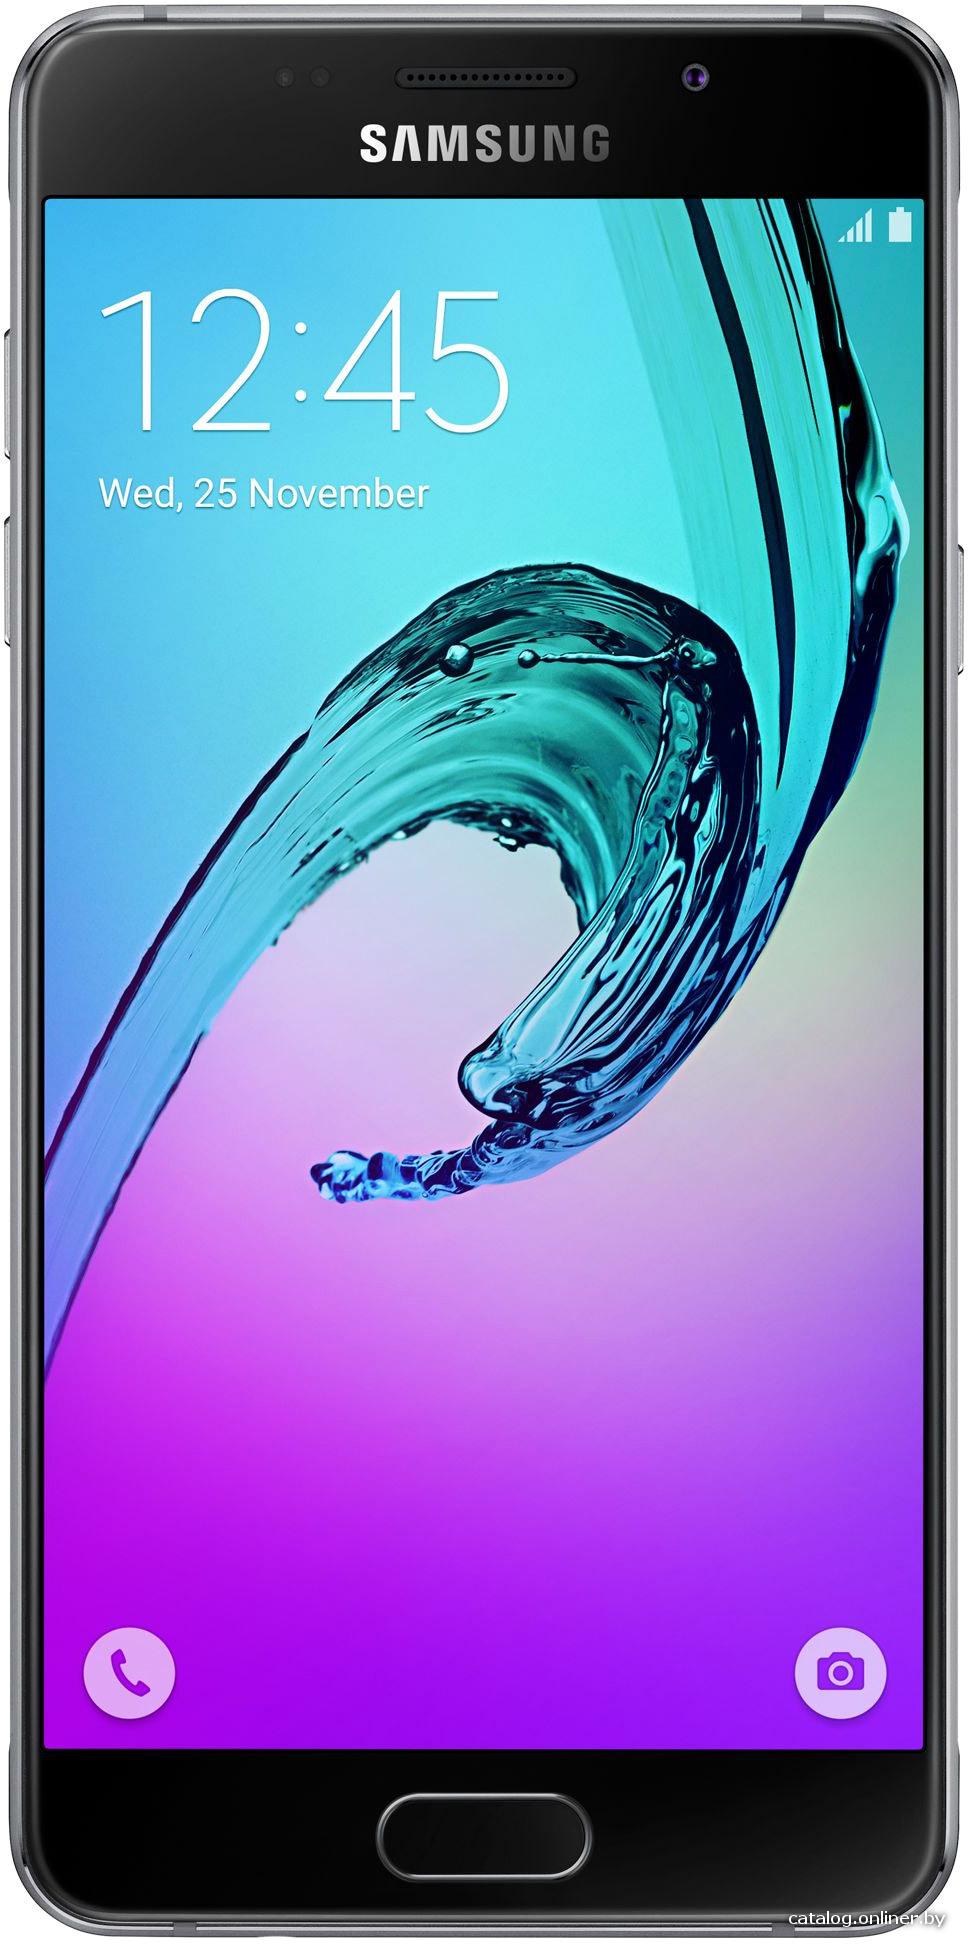 "Смартфон Samsung Galaxy A5 (2016) SM-A510F-DS Black (1.6GHz,2GbRAM,5.2""1920x1080,4G+BT+WiFi+GPS,16Gb+microSD,13Mp,Andr)"